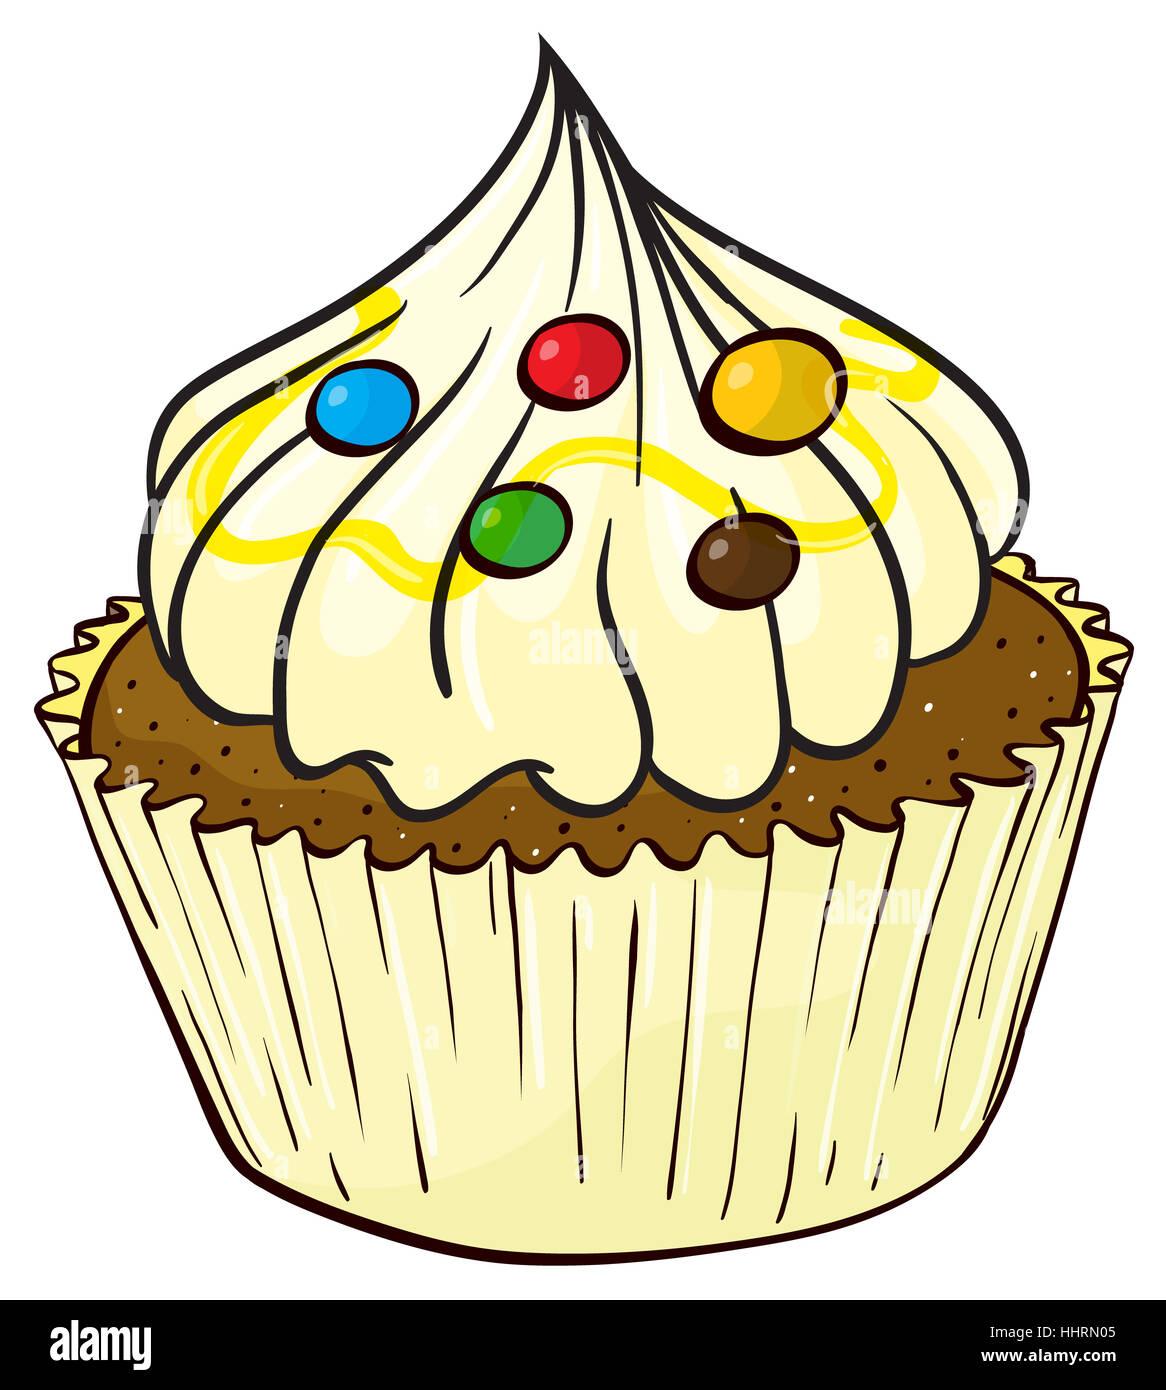 Chocolate Cake Cartoon Images